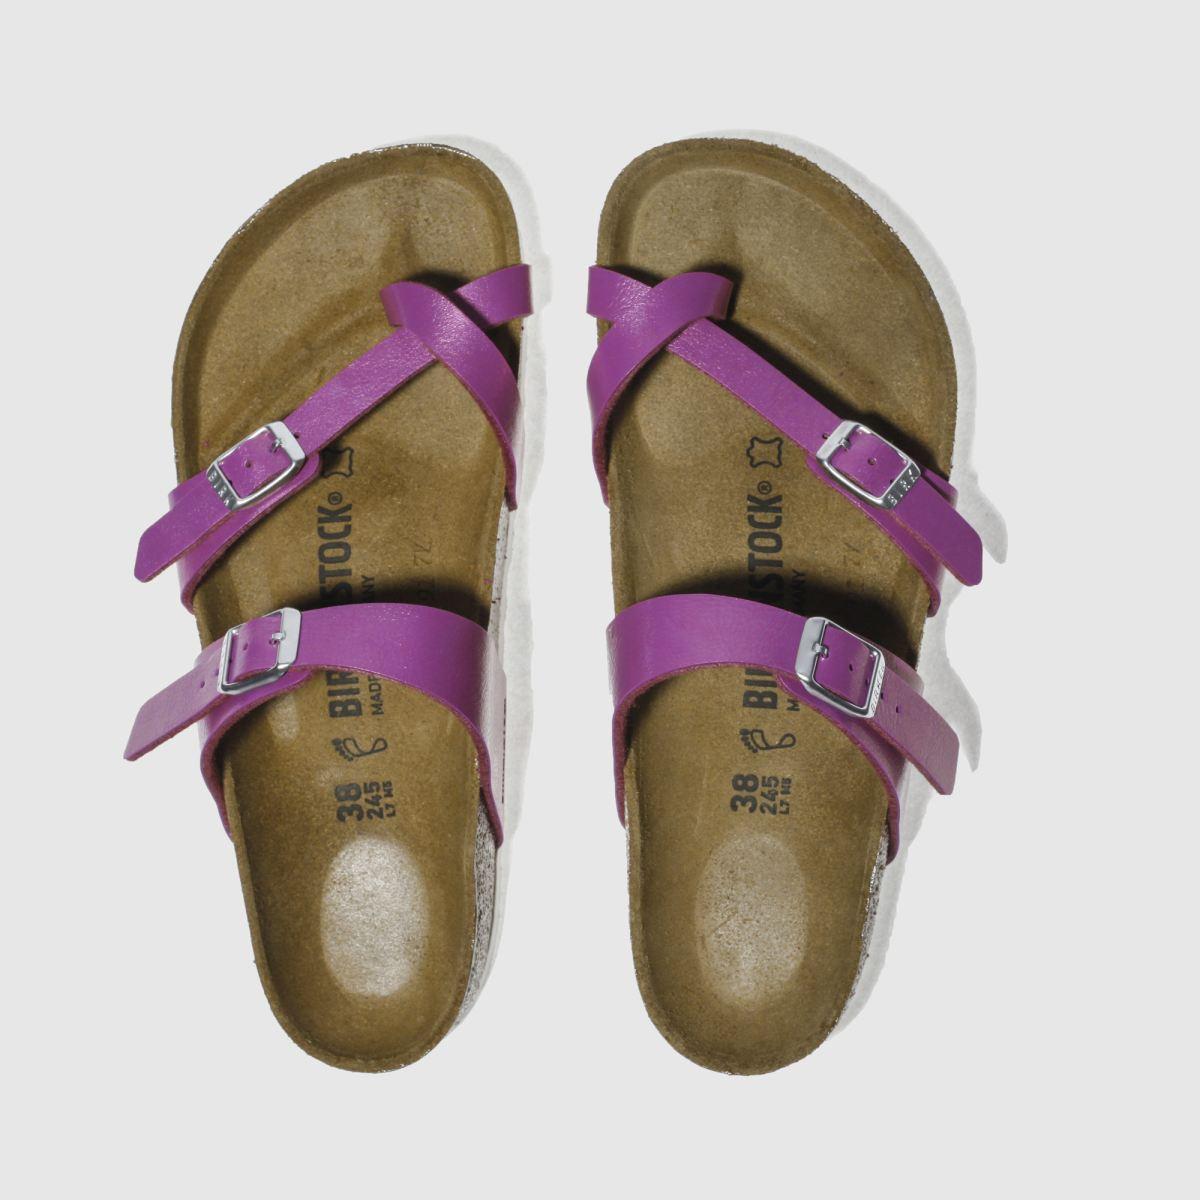 Birkenstock Pink Mayari Sandals